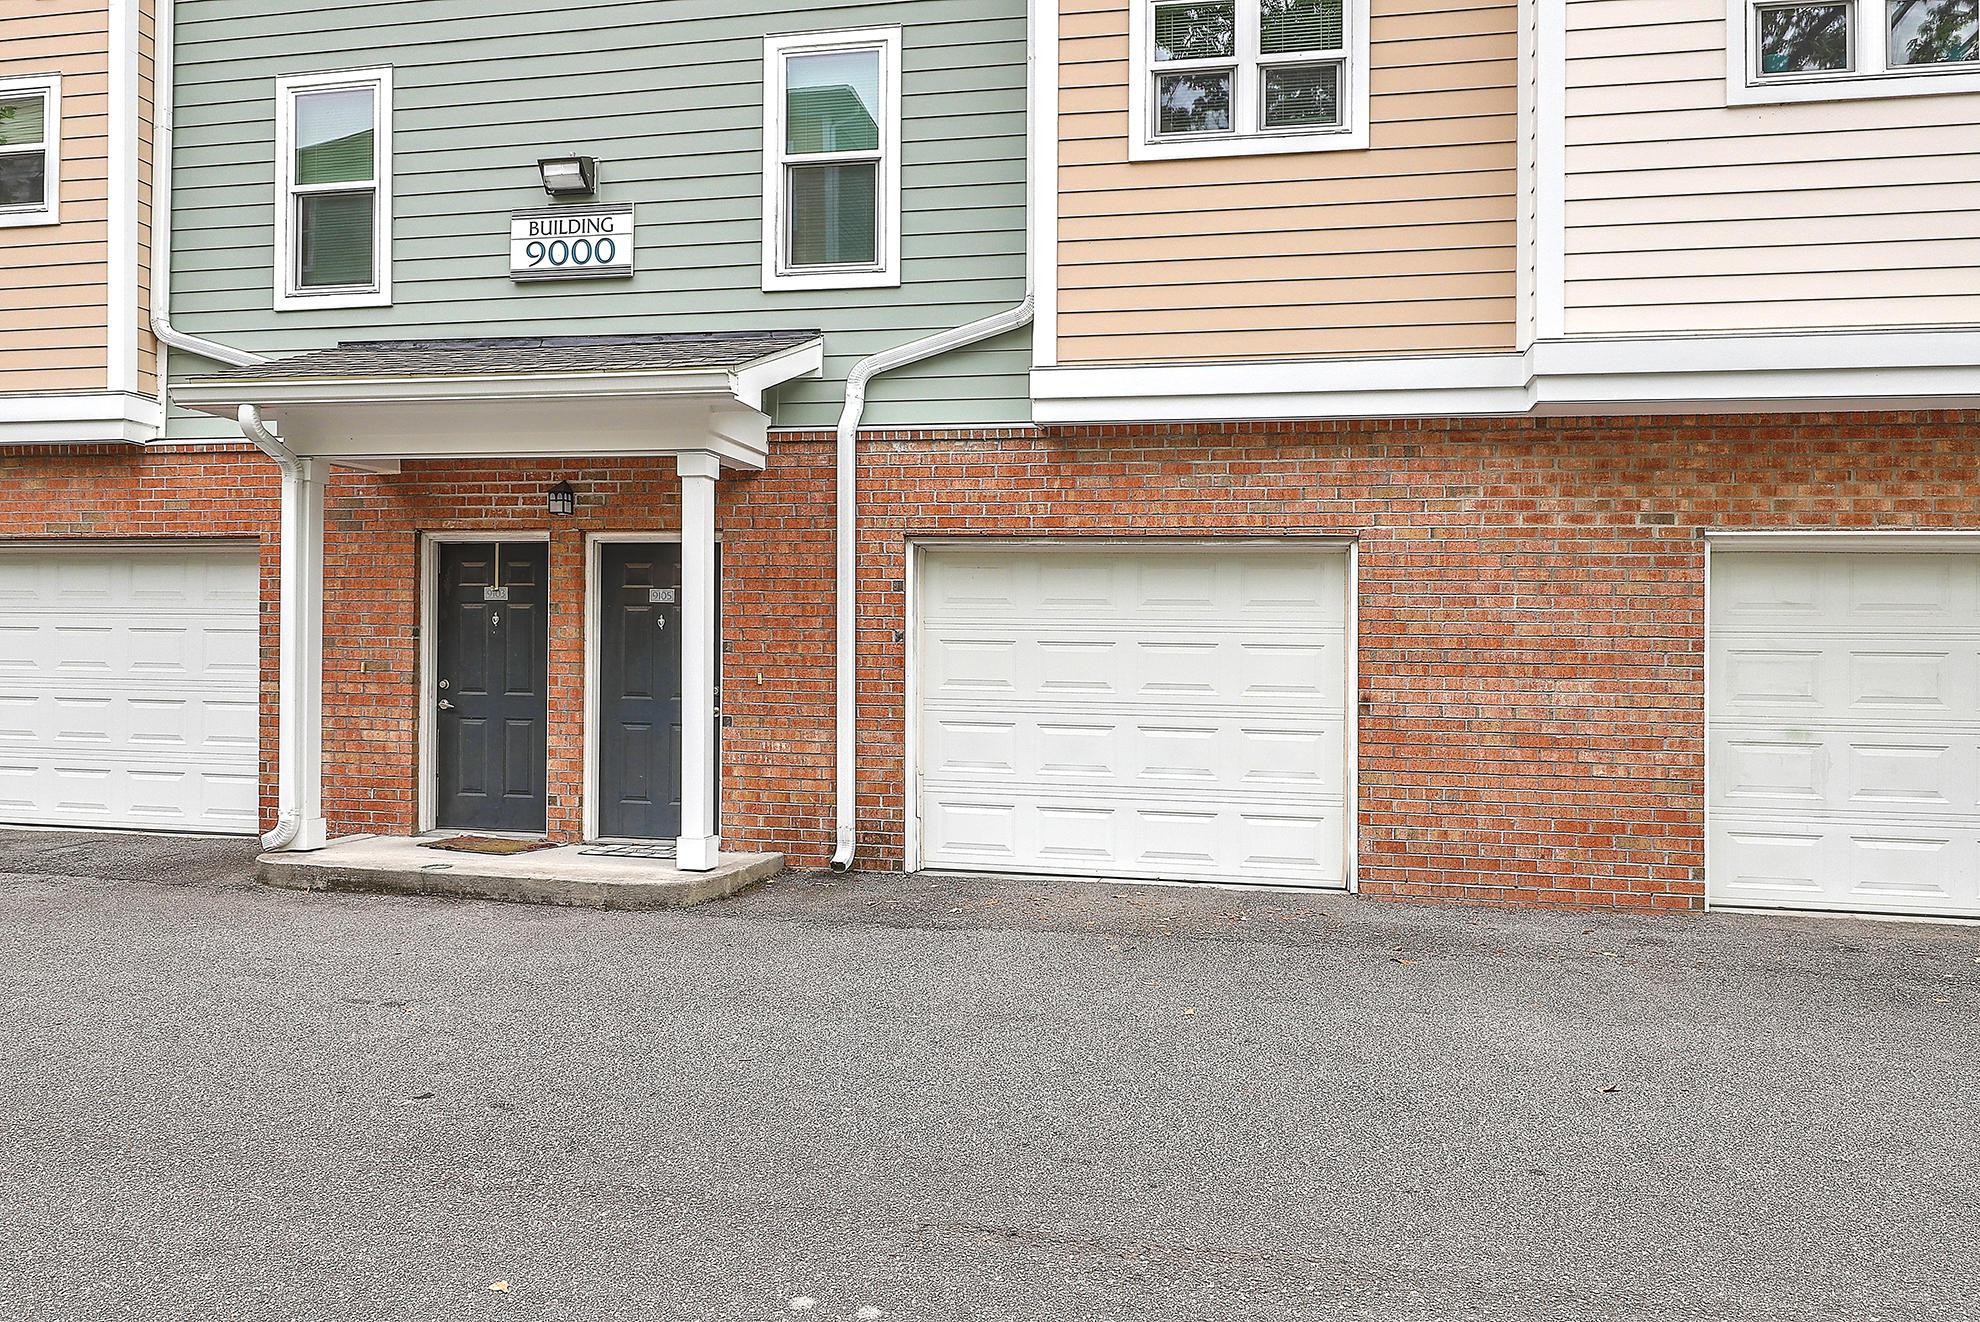 Regatta On James Island Homes For Sale - 1755 Central Park, James Island, SC - 10